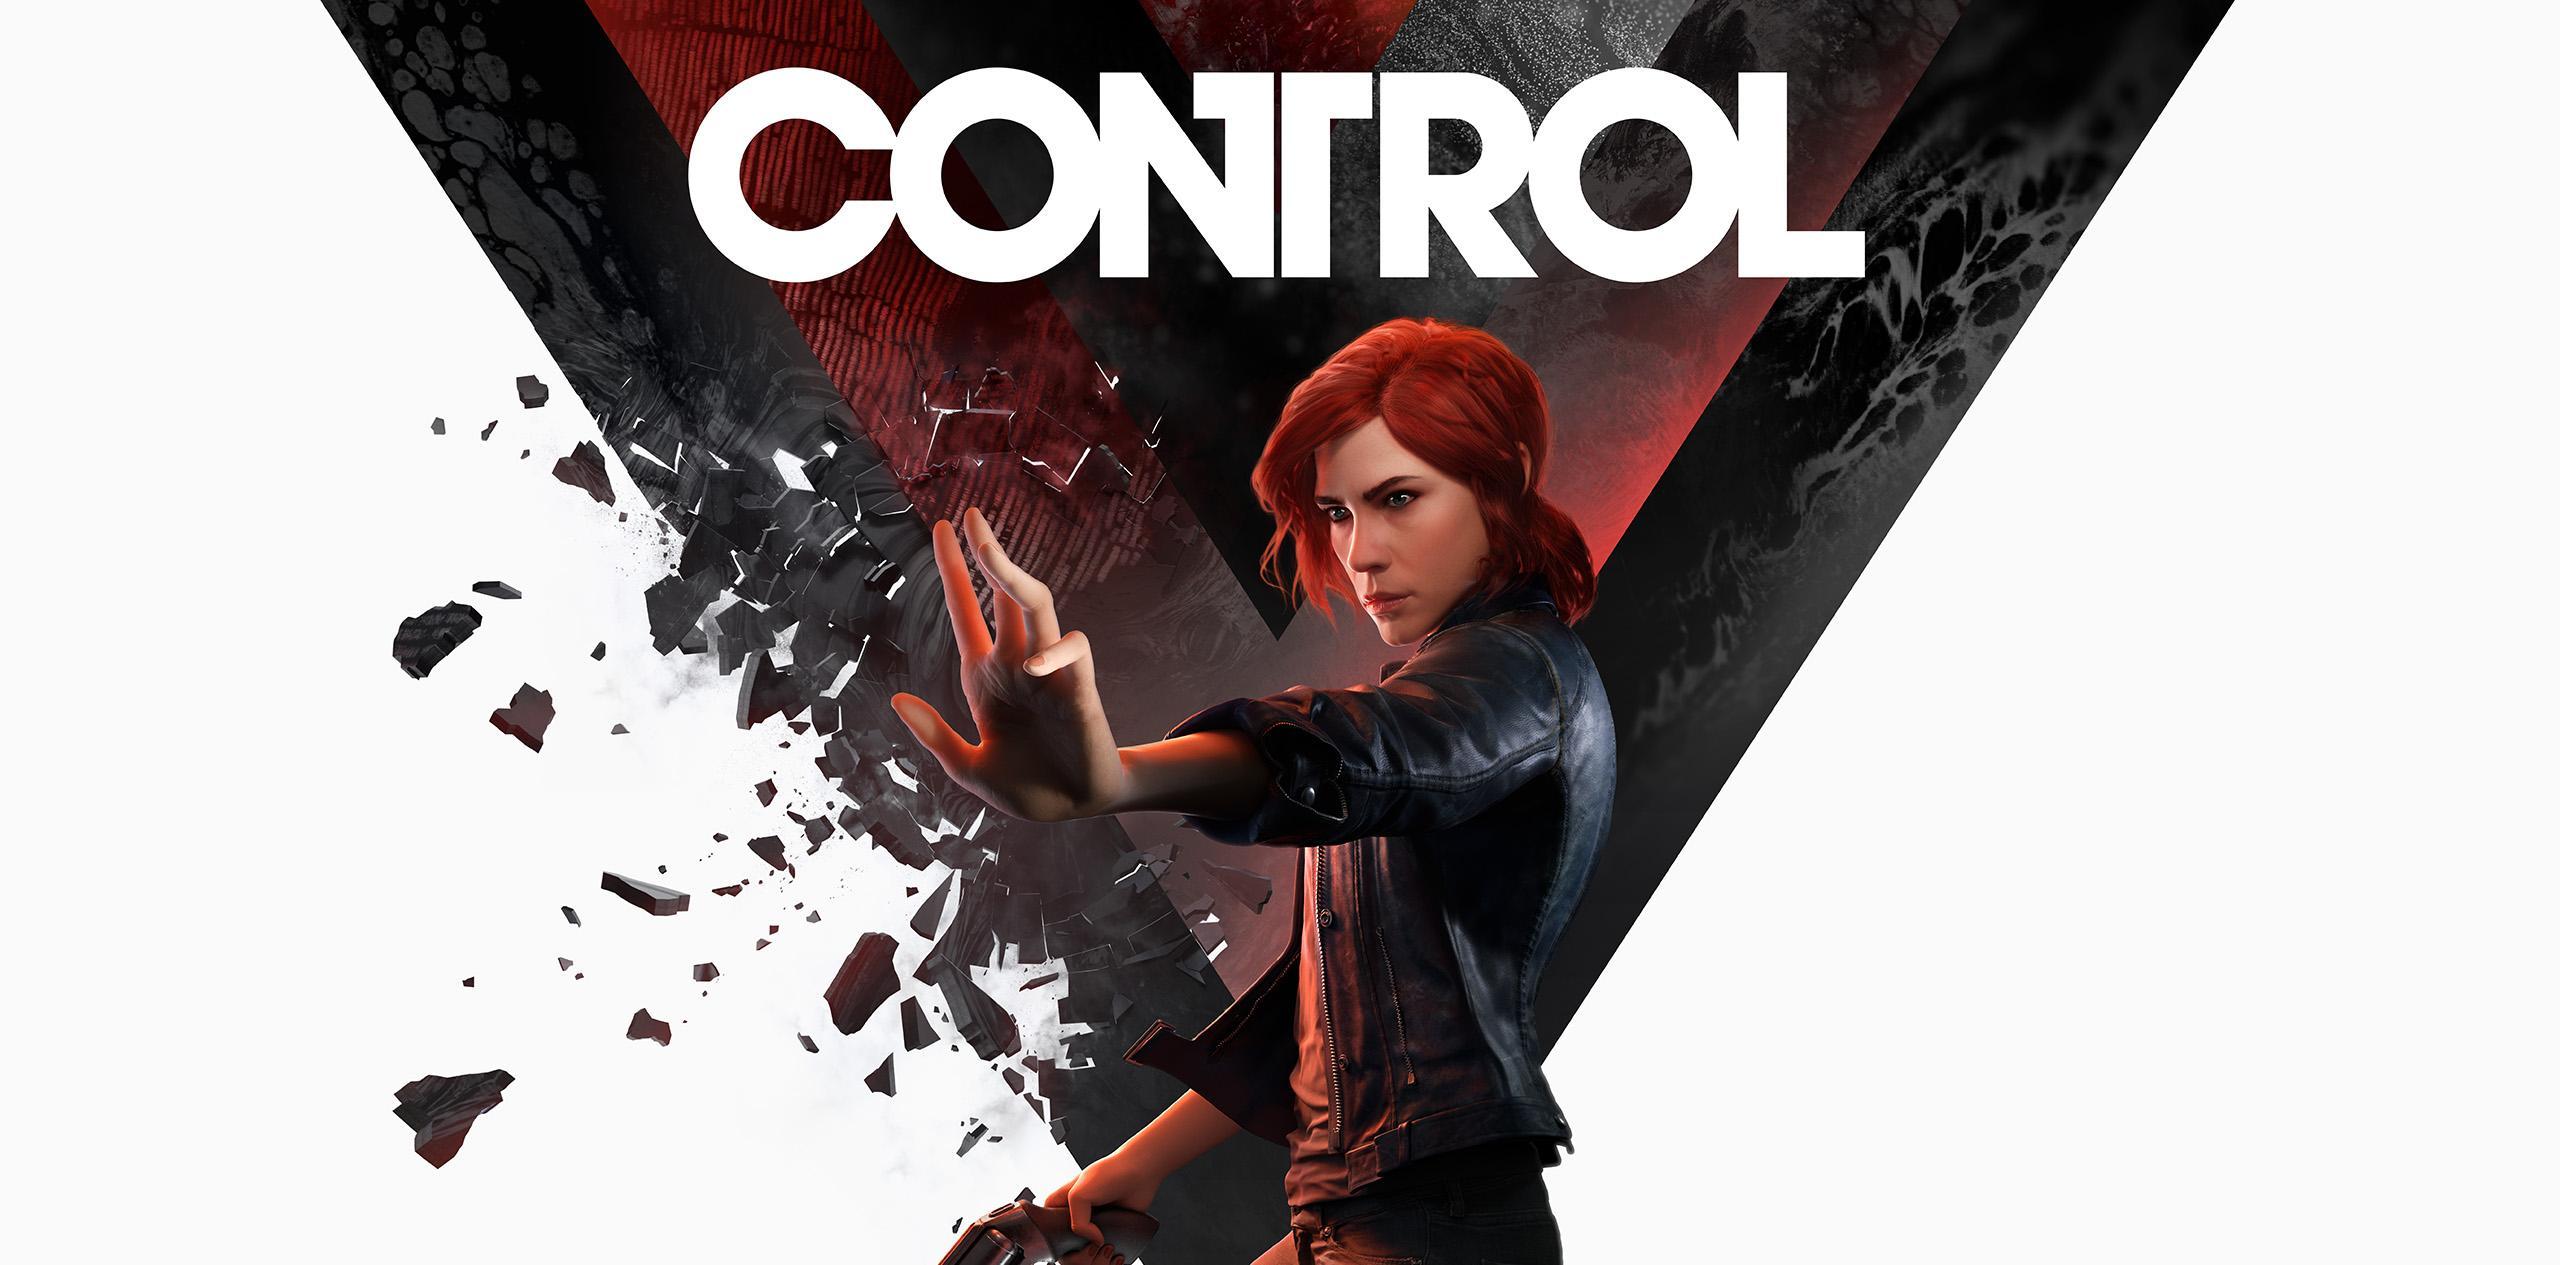 《Control》评测:超能力与射爆的无缝衔接,Remedy风味十足